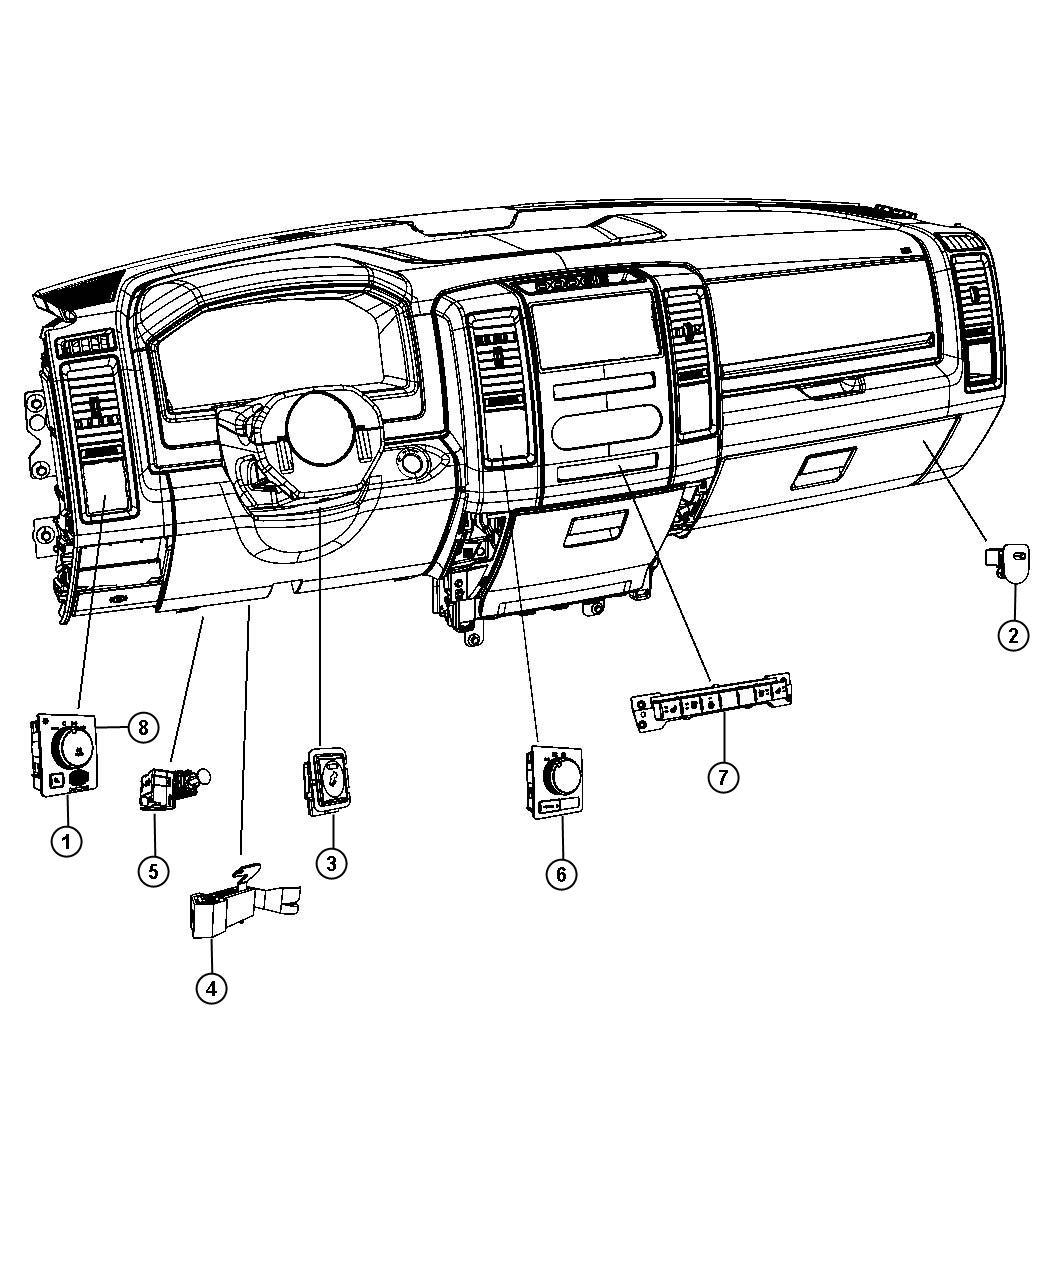 2012 Dodge Ram 2500 Switch. Instrument panel. [jkv], [xaa